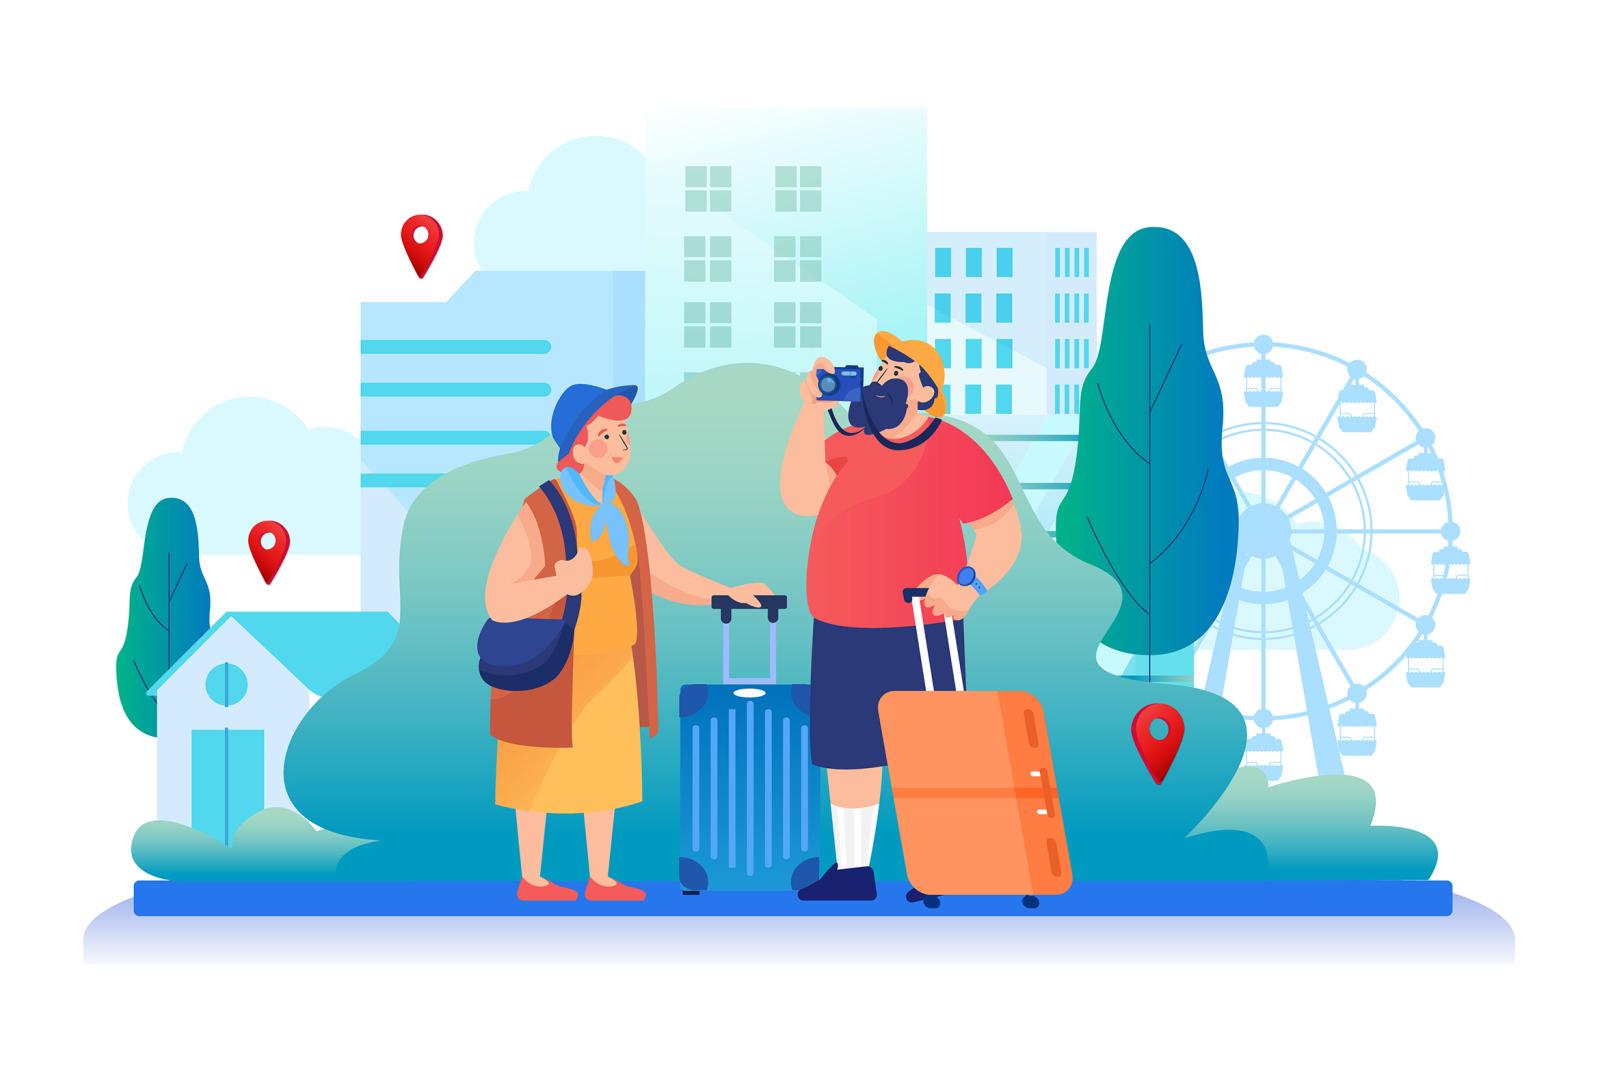 M57_Travel Illustrations